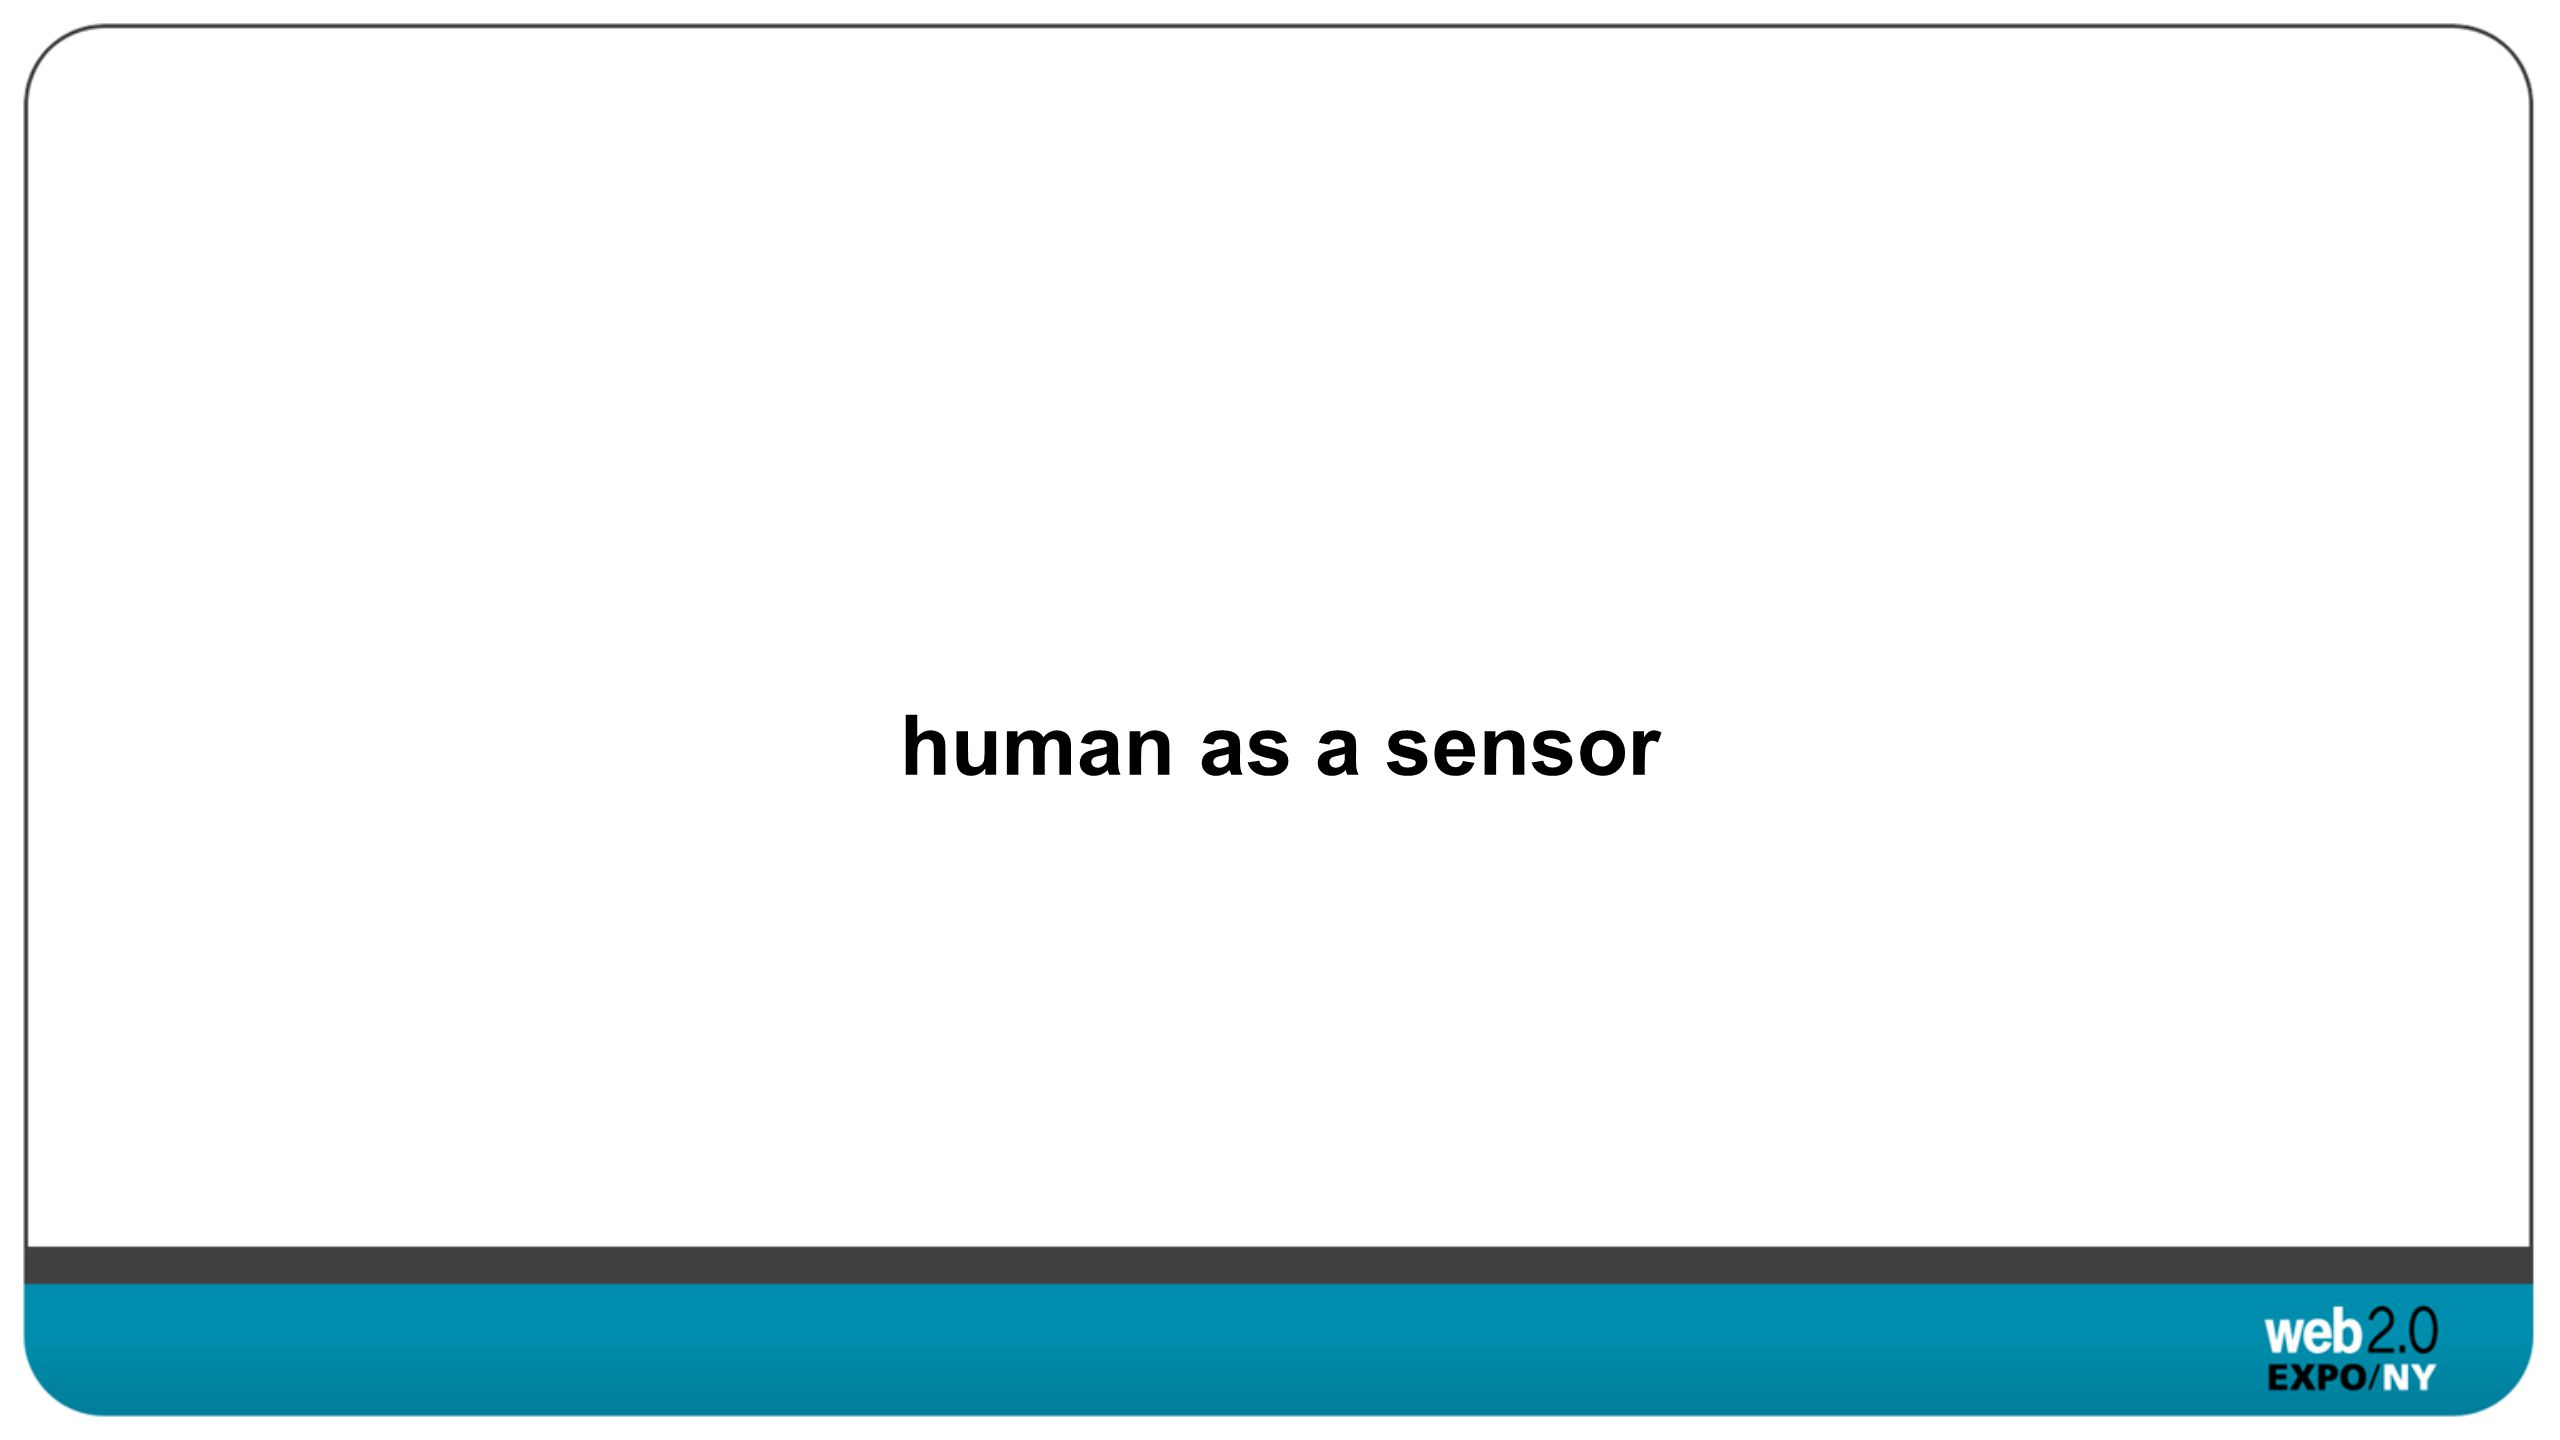 human as a sensor